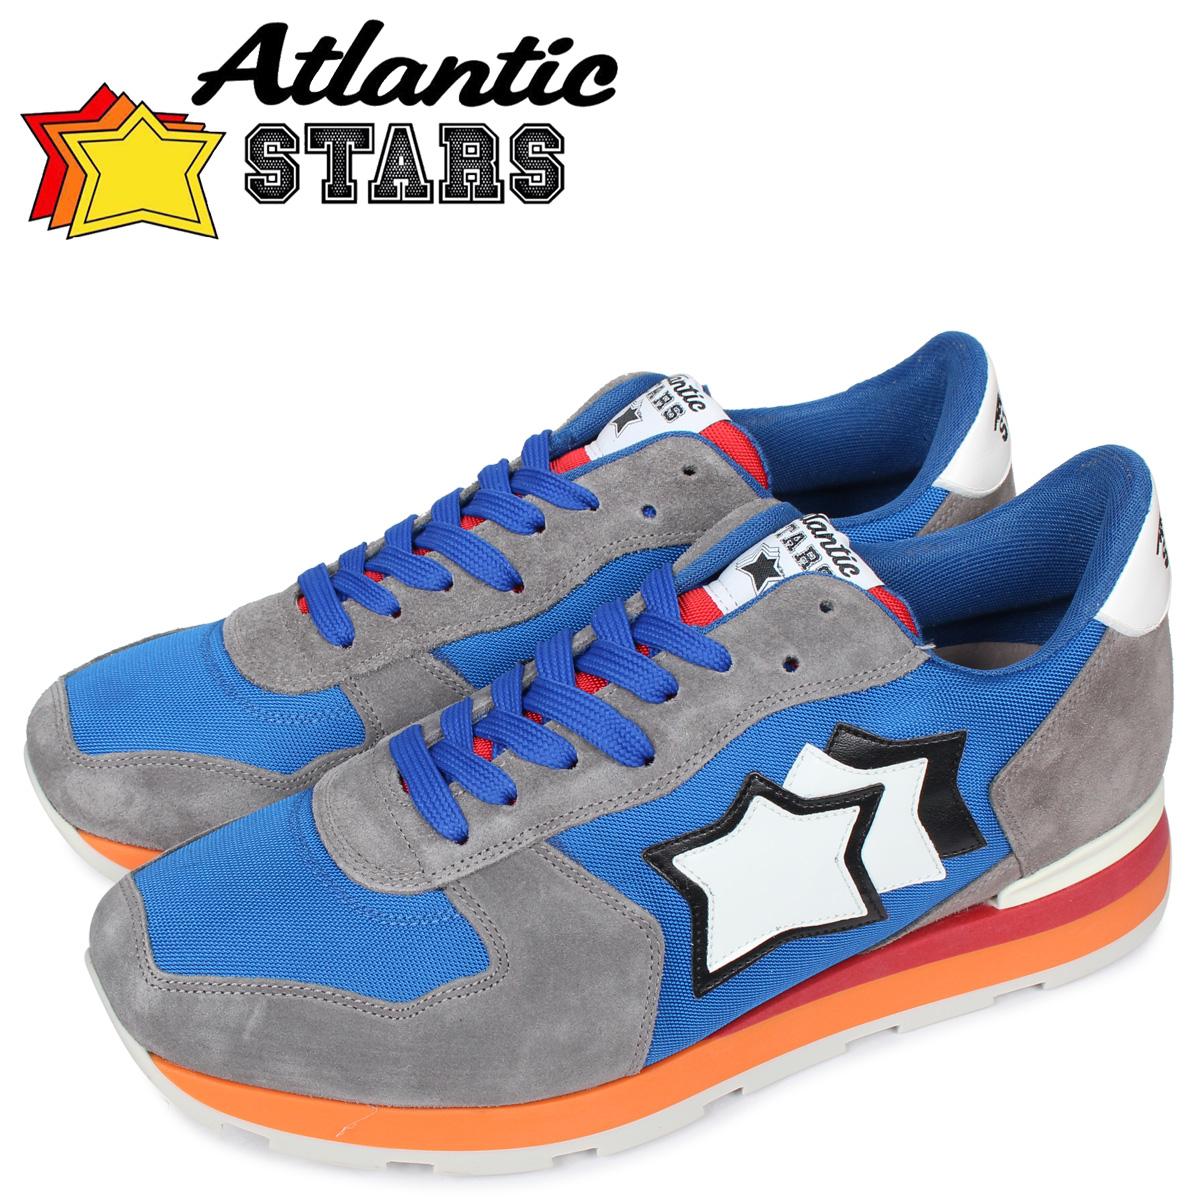 Atlantic STARS アトランティックスターズ アンタレス スニーカー メンズ ANTARES ブルー ANR-85B [5/11 新入荷]